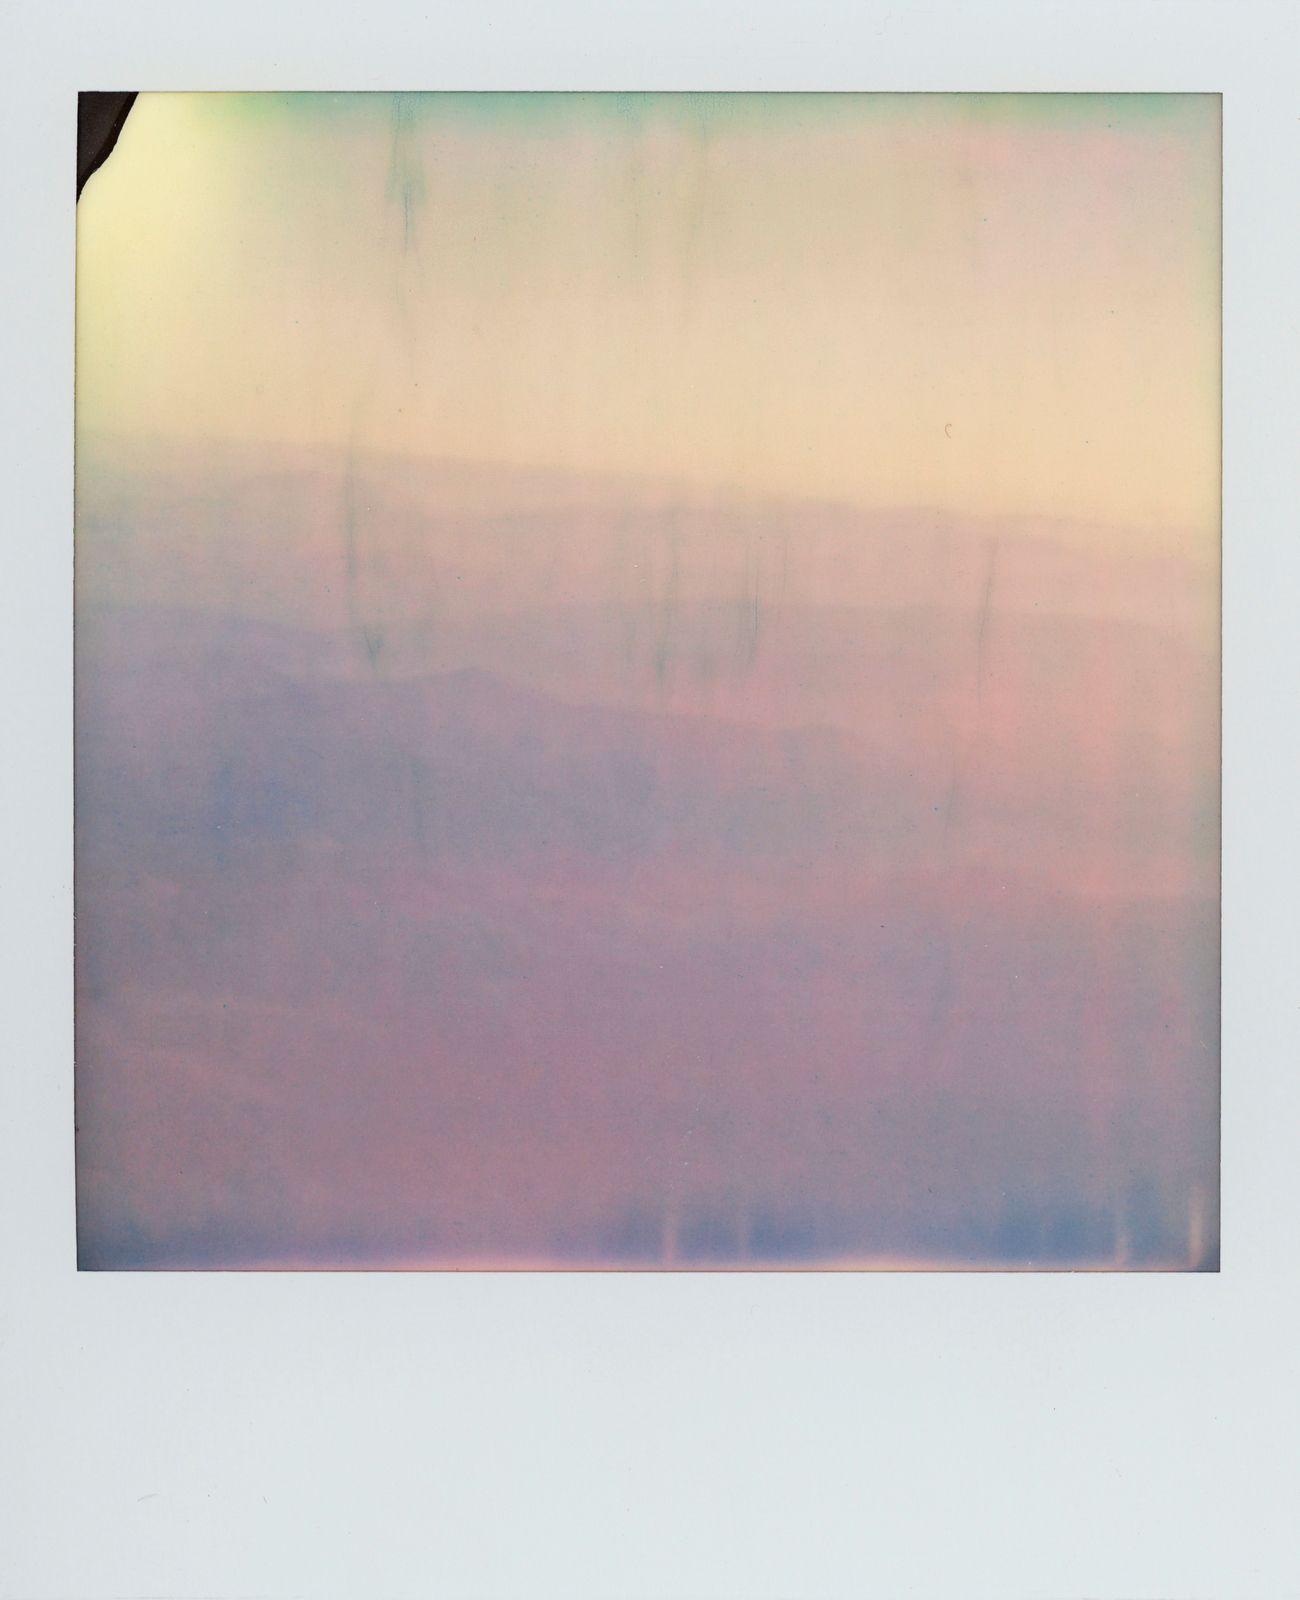 polaroid-0004c.JPG